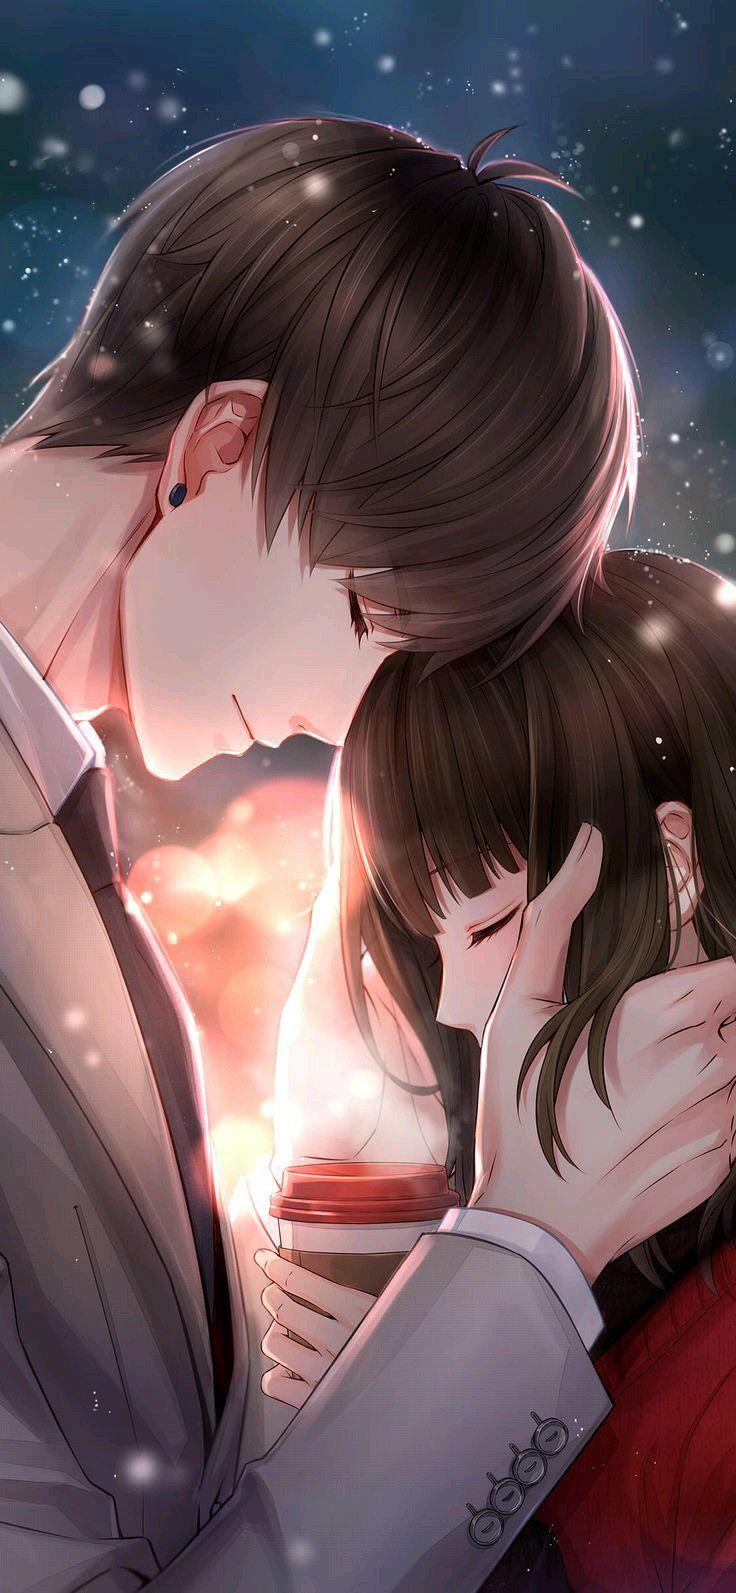 Pinterest Nor Syafiqah Cosplay Anime Pasangan Anime Lucu Animasi